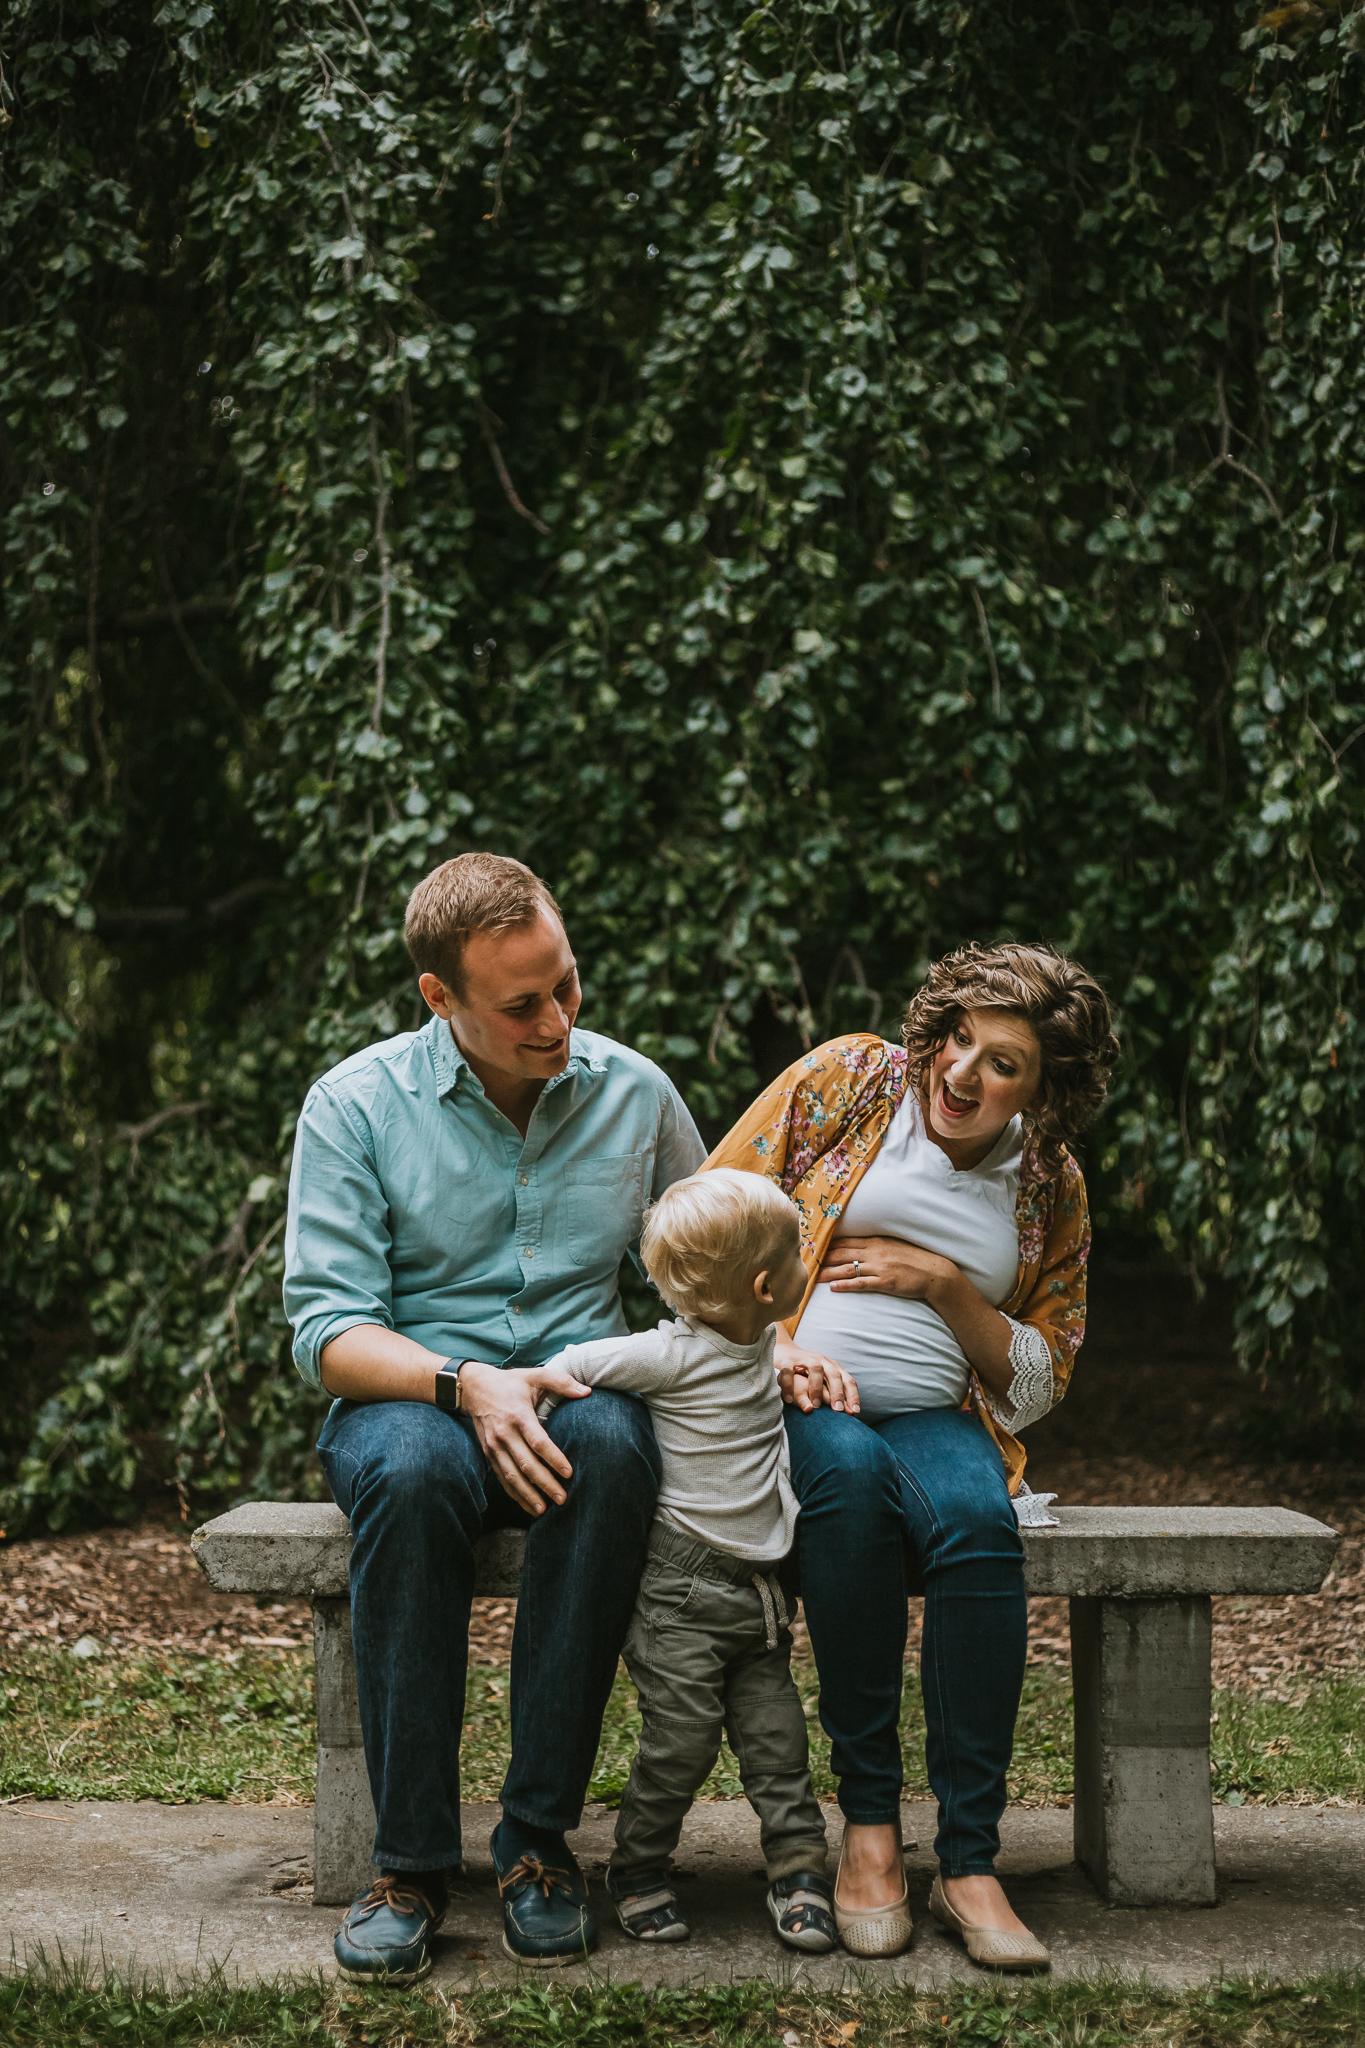 Spokane Family Photography